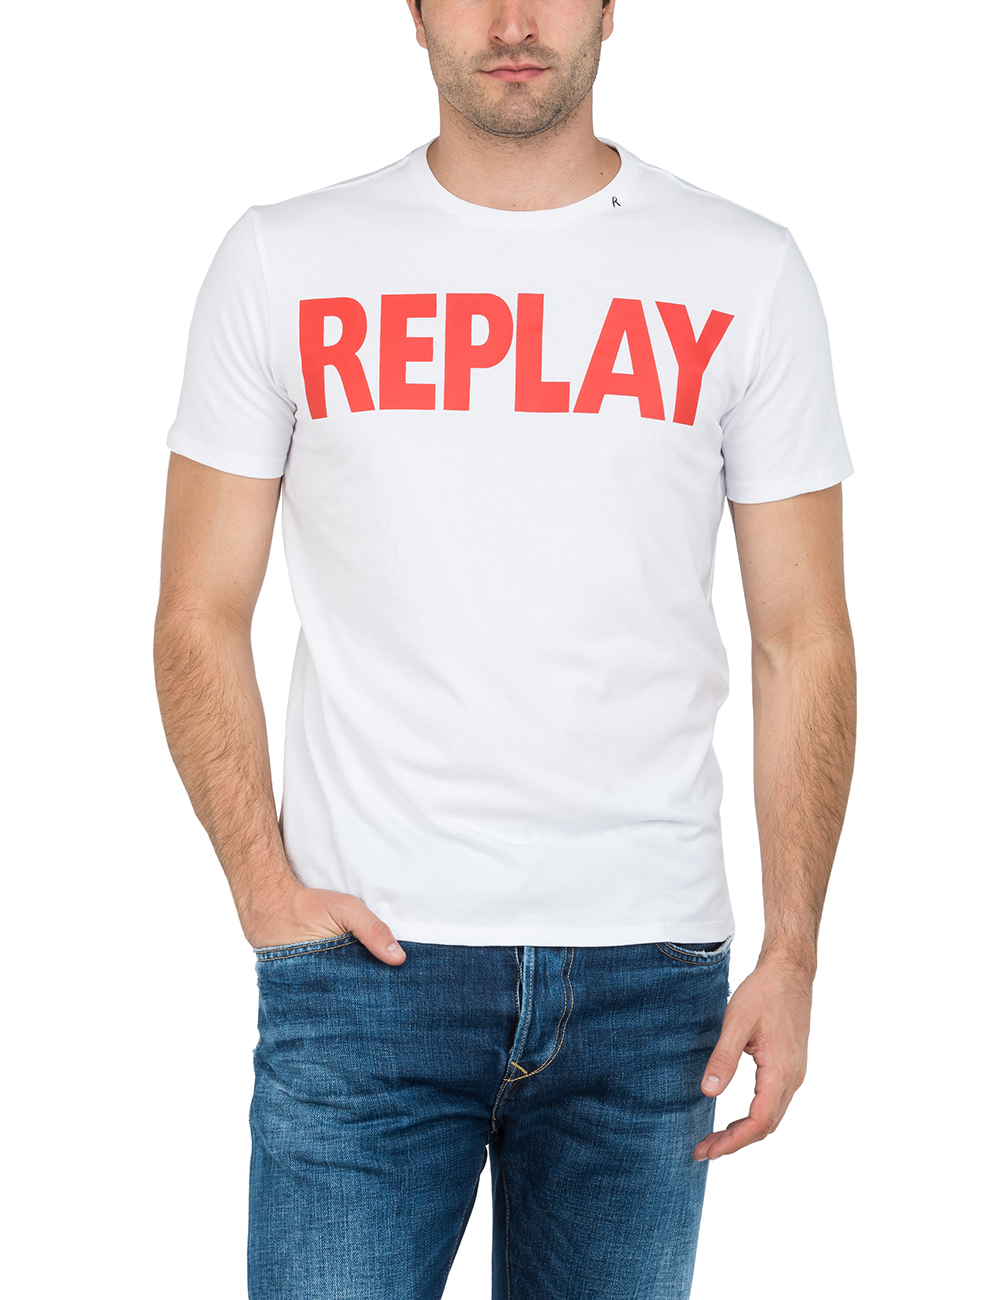 Tee-shirt blanc avec logo